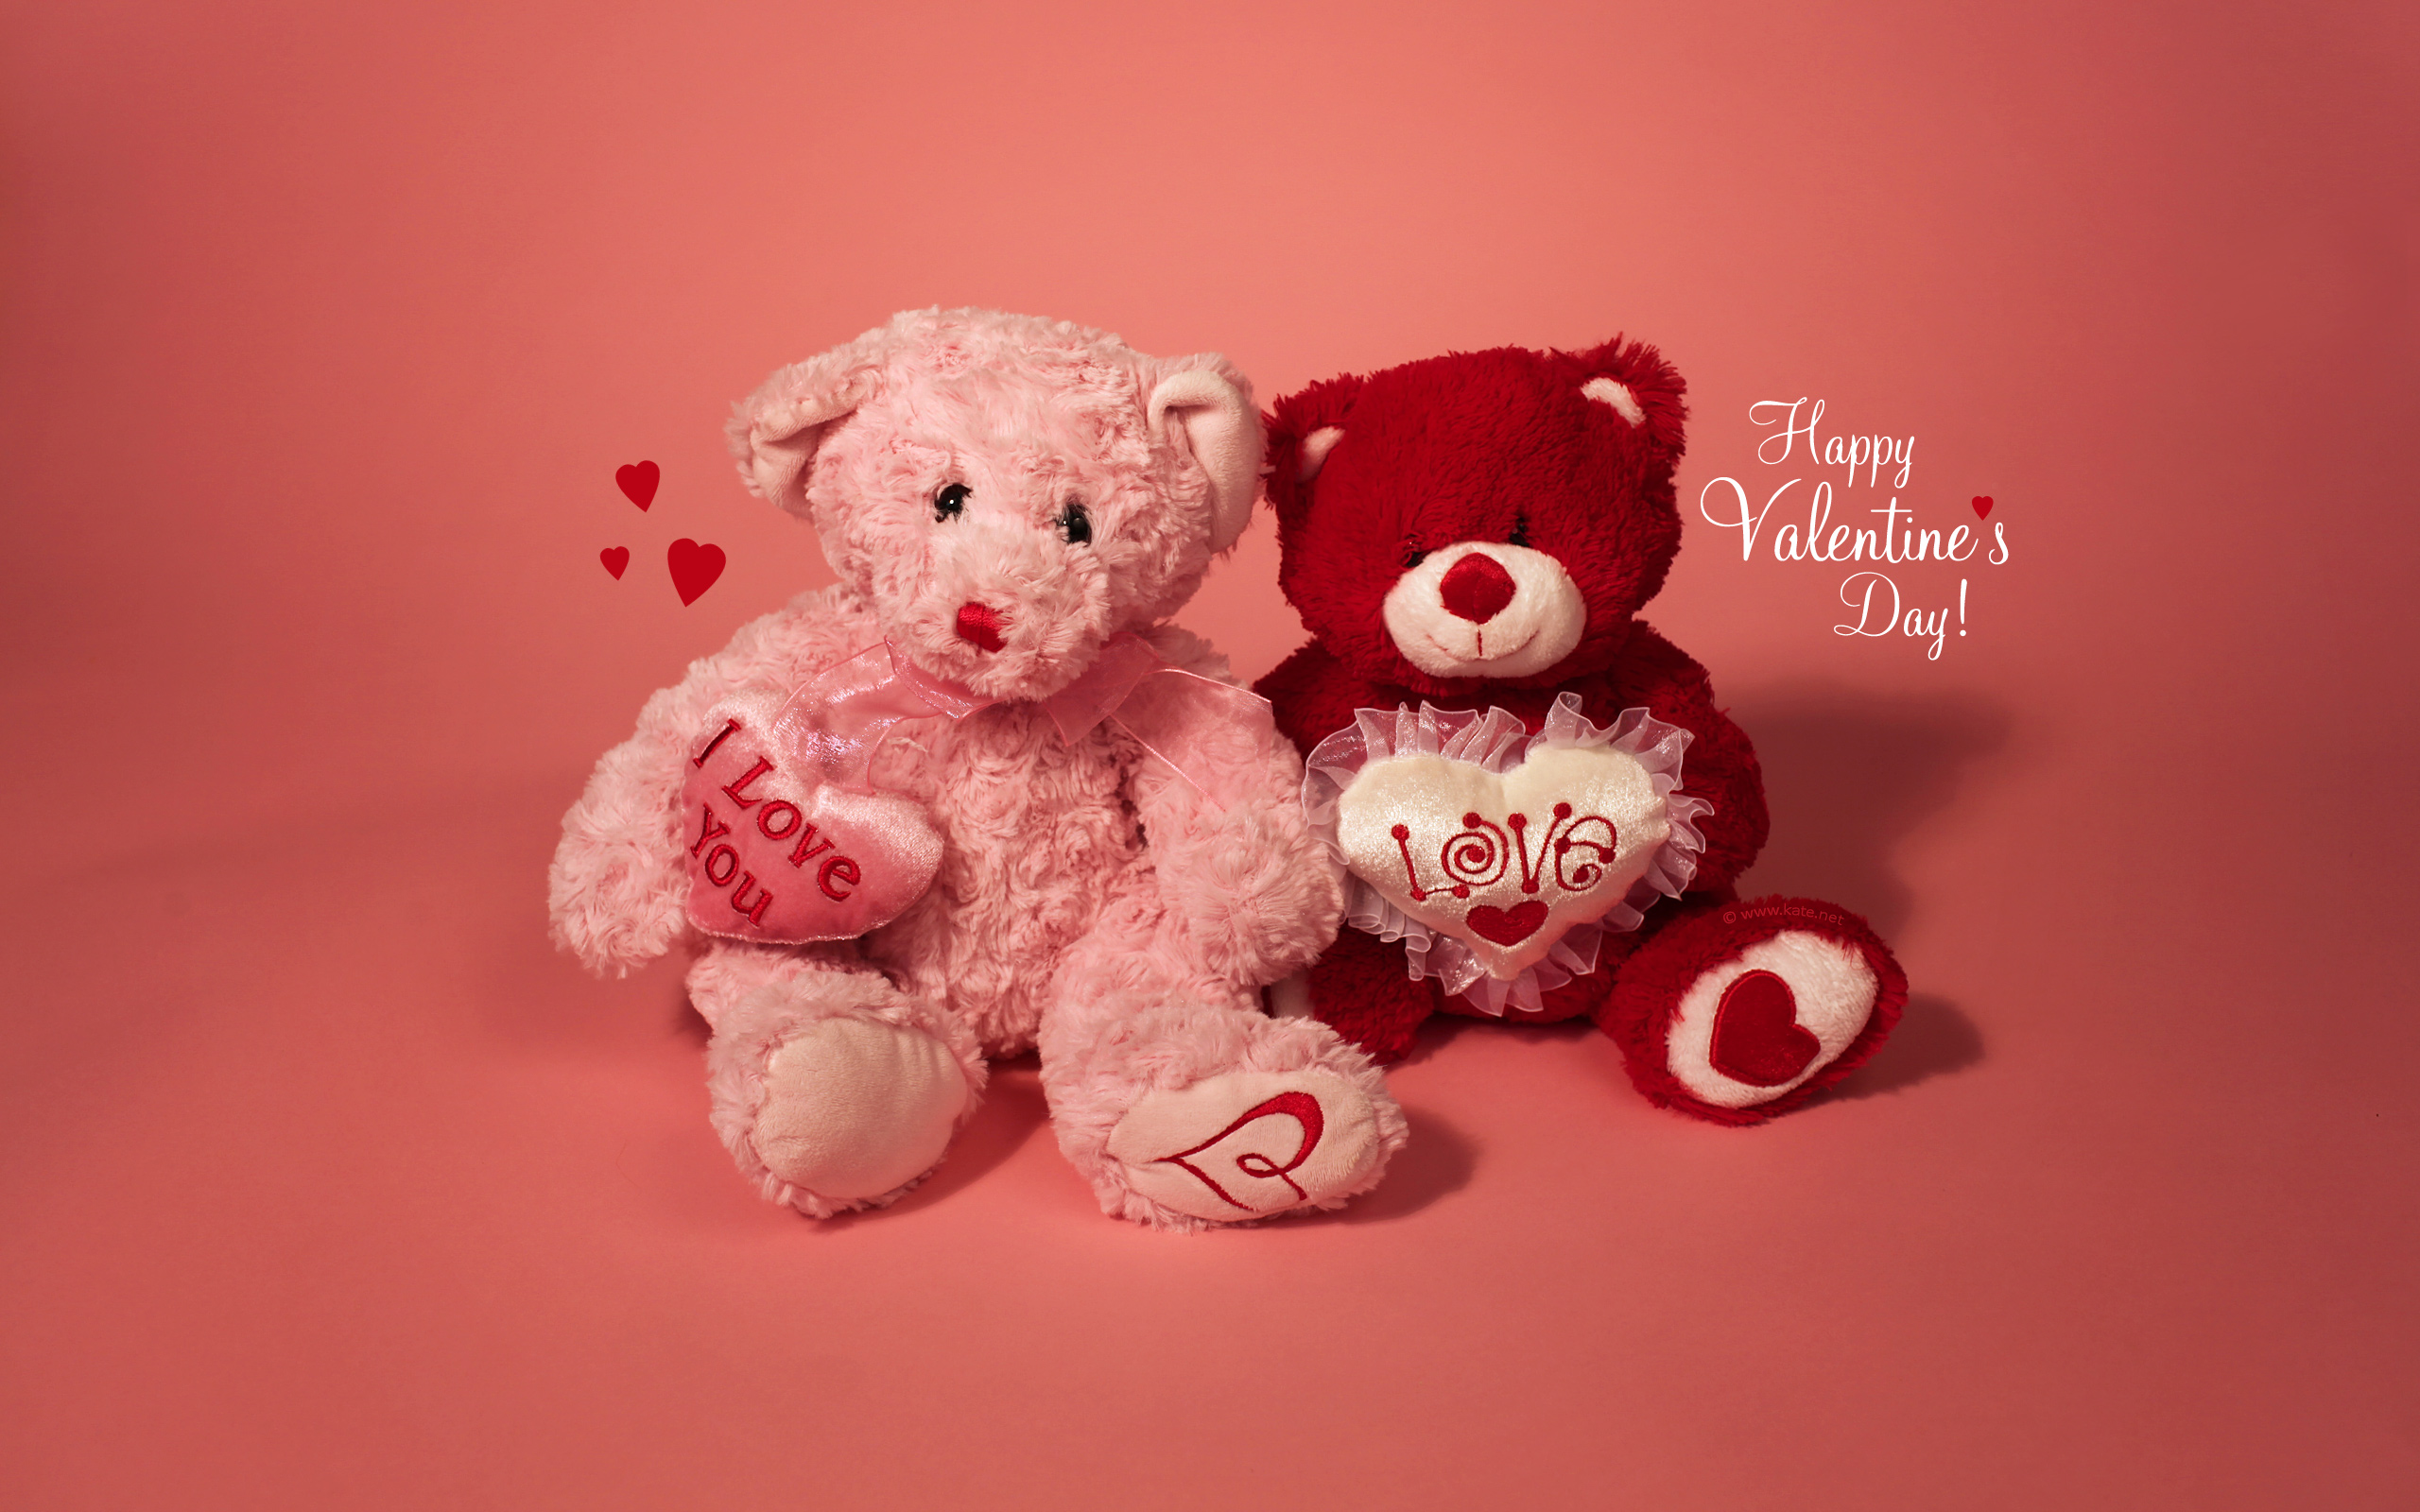 valentines day teddy bear wallpaper free hd desktop